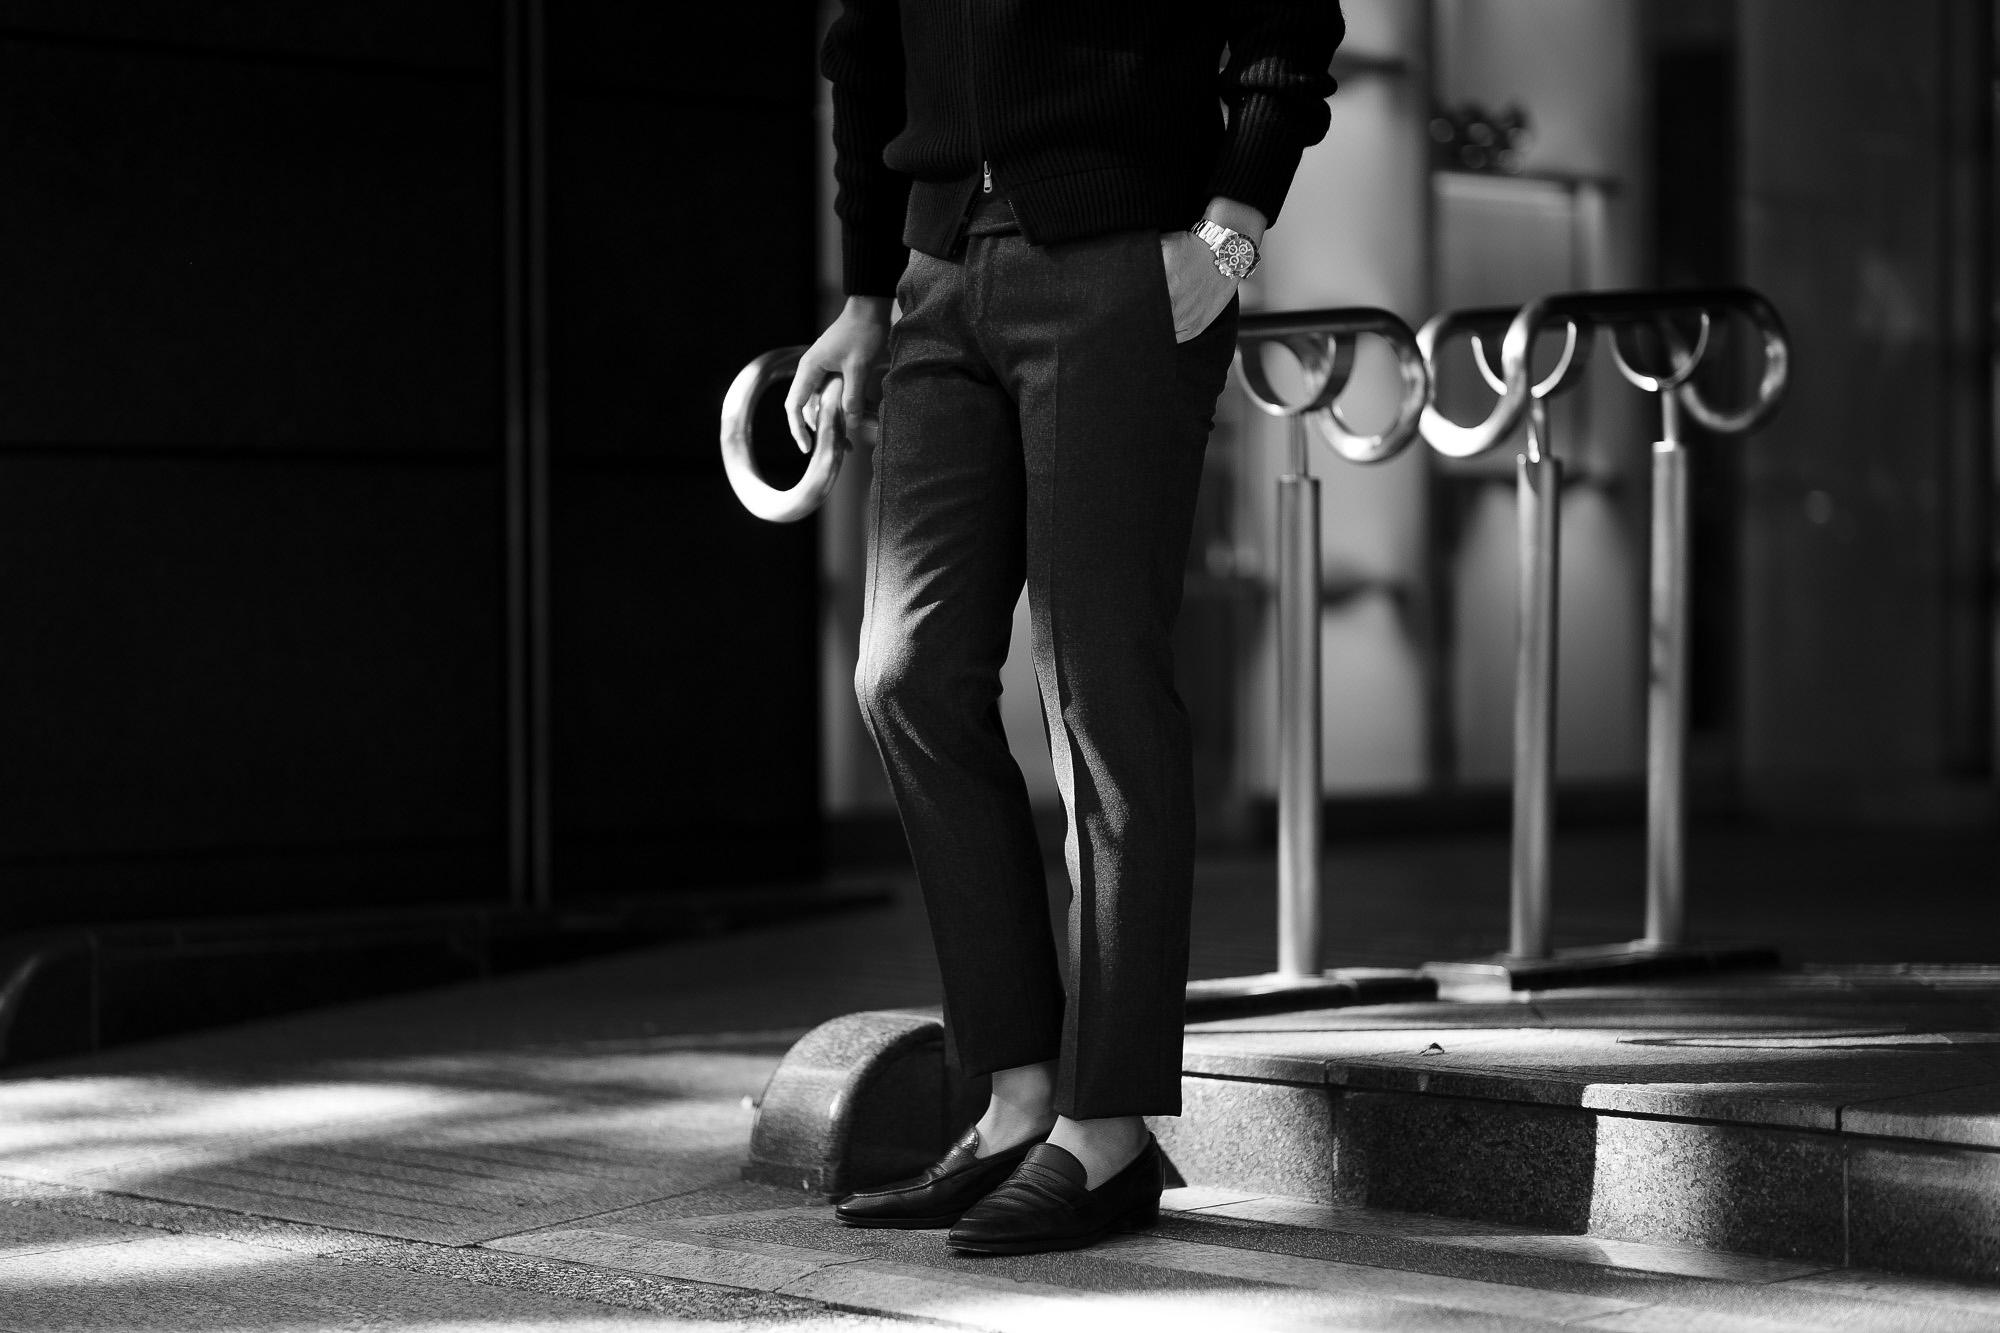 INCOTEX (インコテックス) N35 SLIM FIT (1T0N35) SUPER 100'S WORSTED FLANNEL フランネル ウール スラックス BROWN (ブラウン・610)  2020 秋冬 【ご予約受付中】愛知 名古屋 altoediritto アルトエデリット